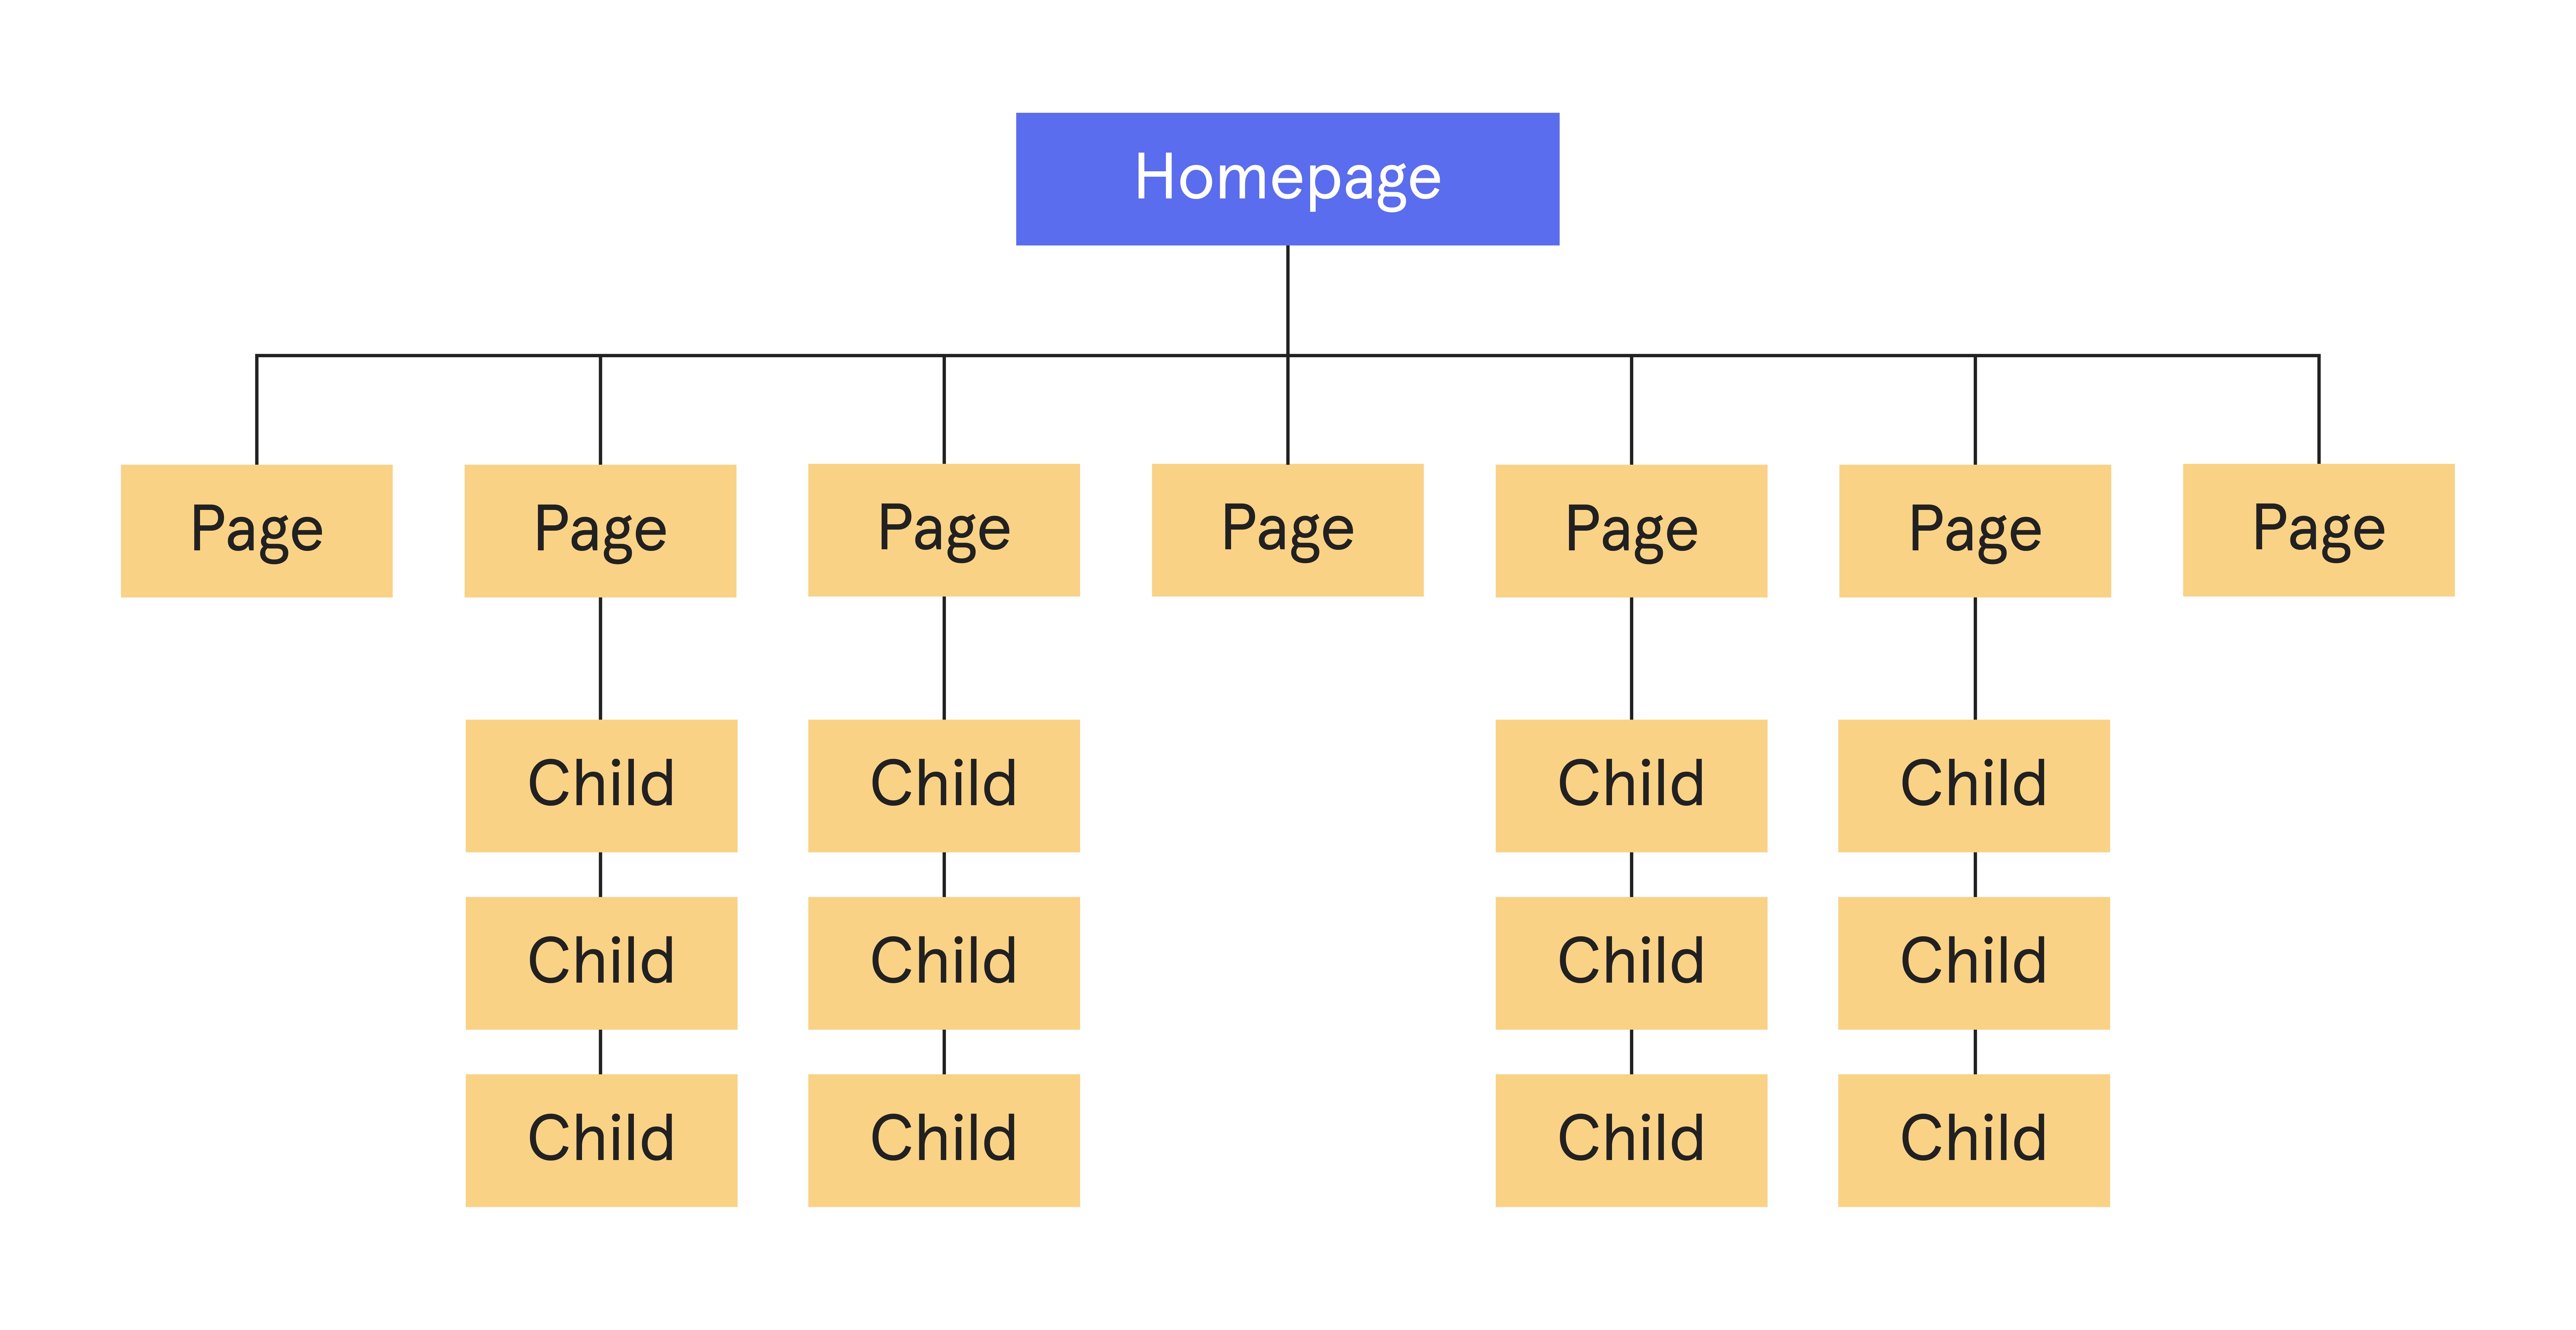 Homepage navigation example diagram